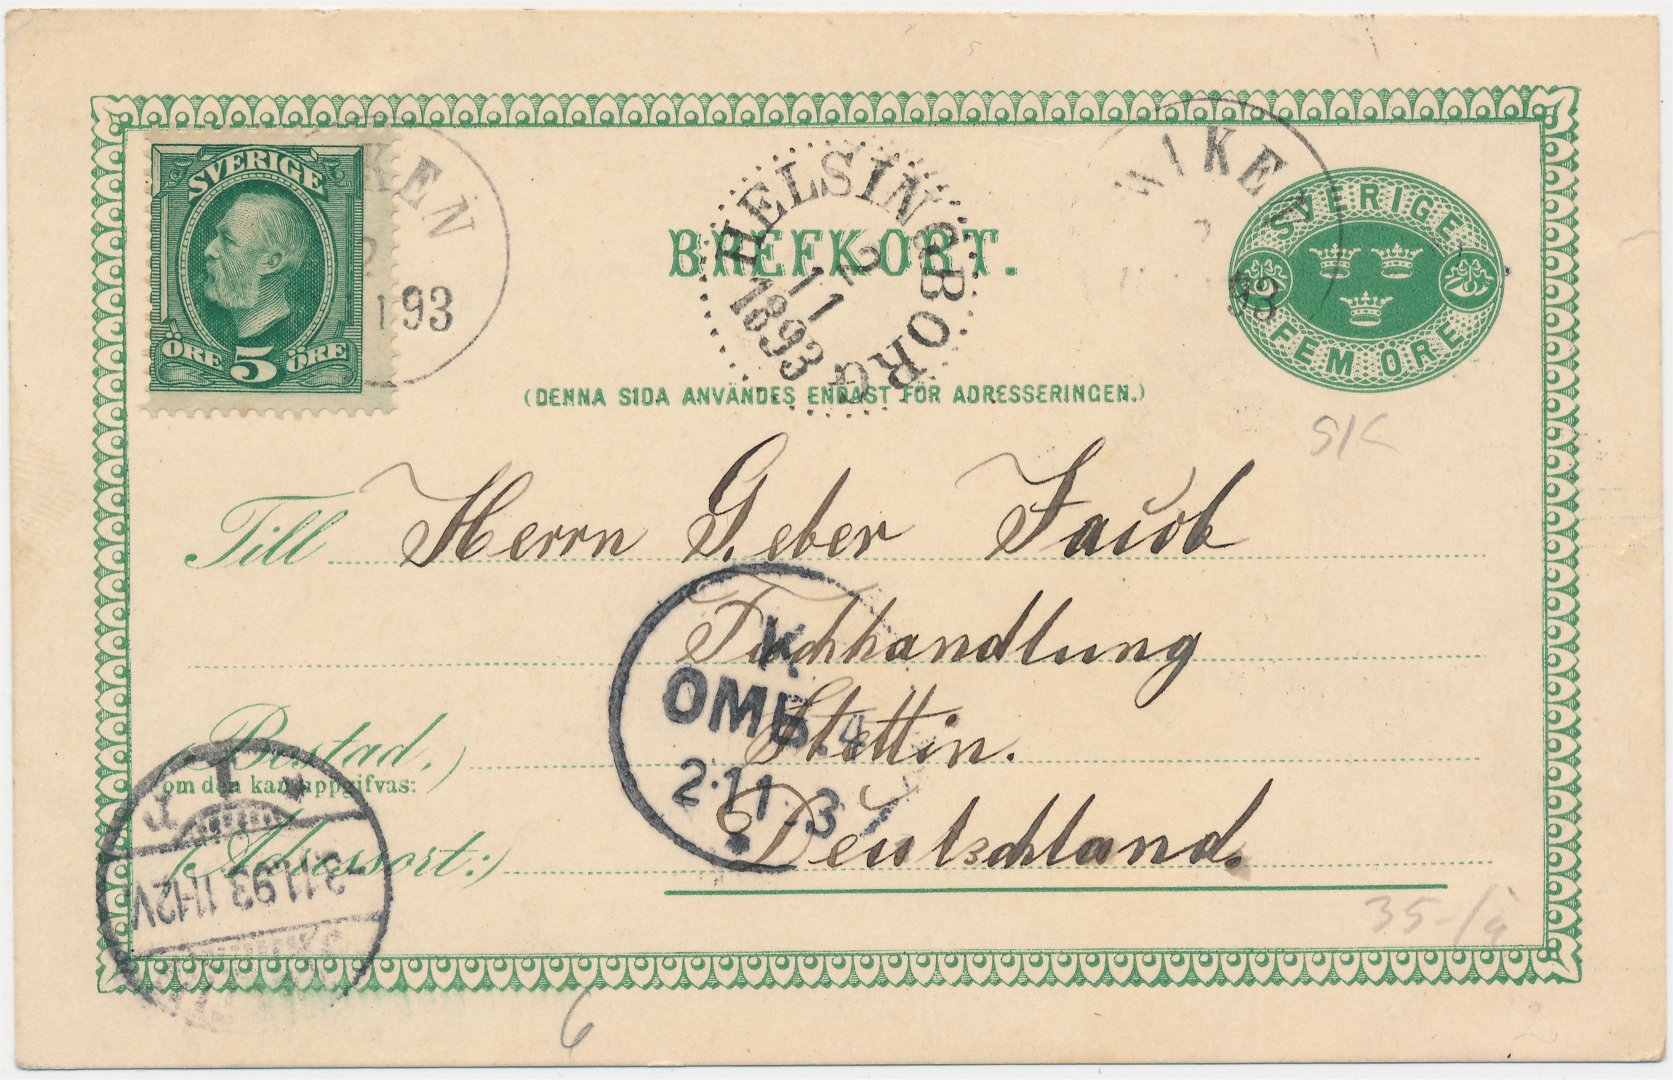 10_brevkort_wiken_2_11_1893